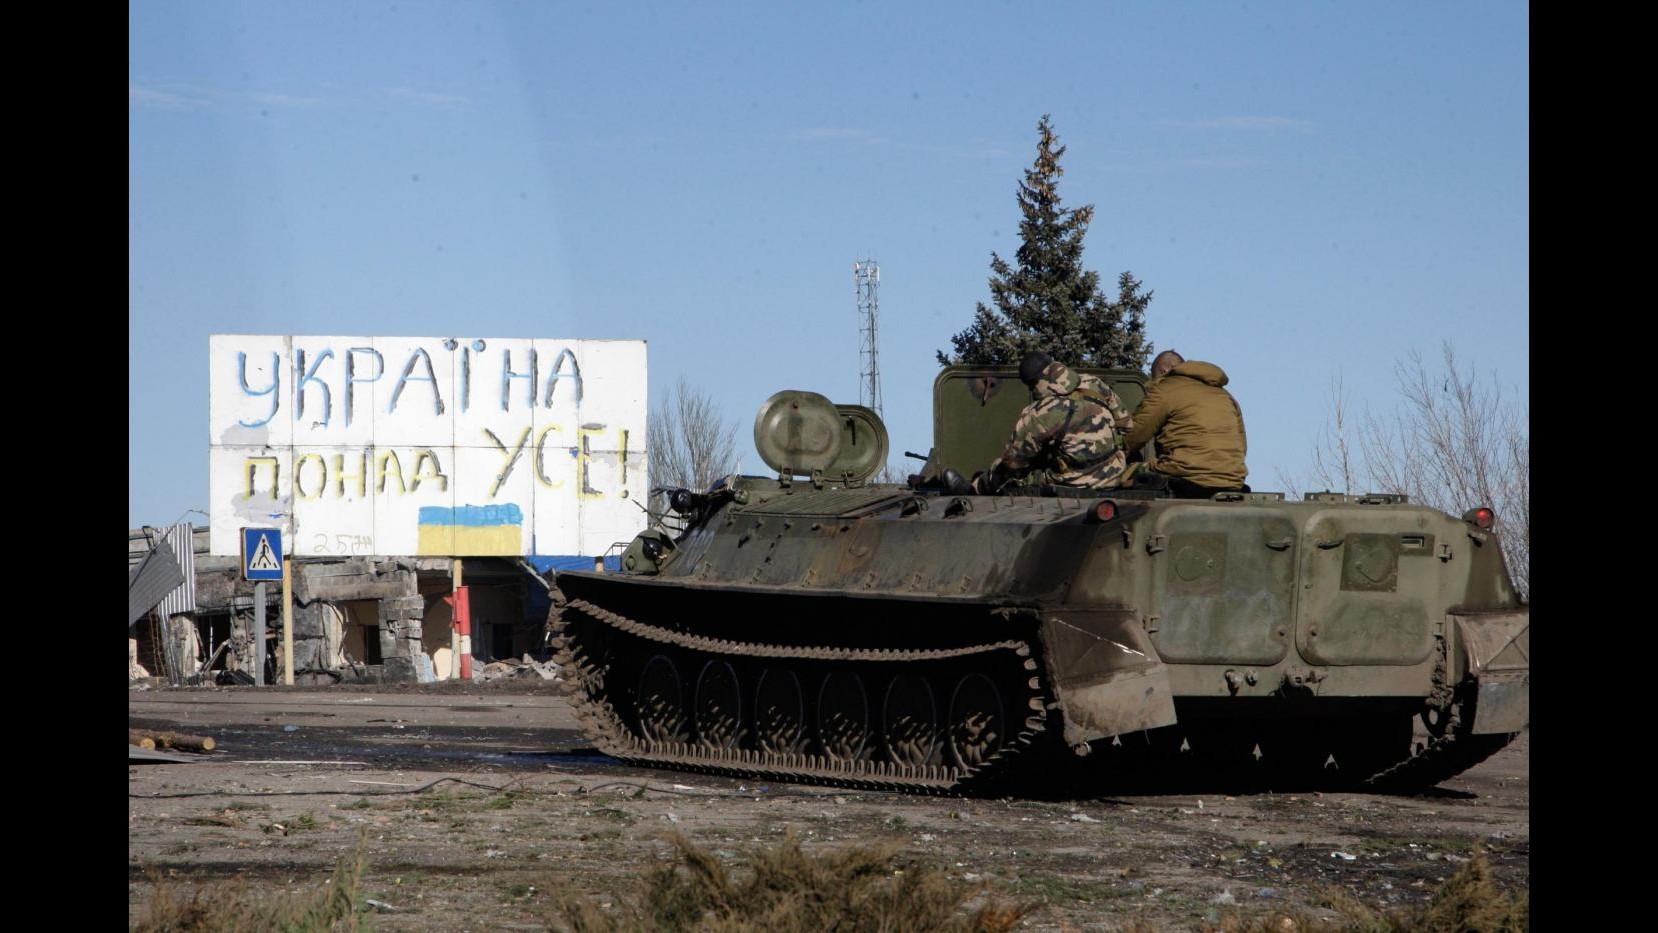 Ucraina, Amnesty: Uccisi da filorussi 4 soldati prigionieri